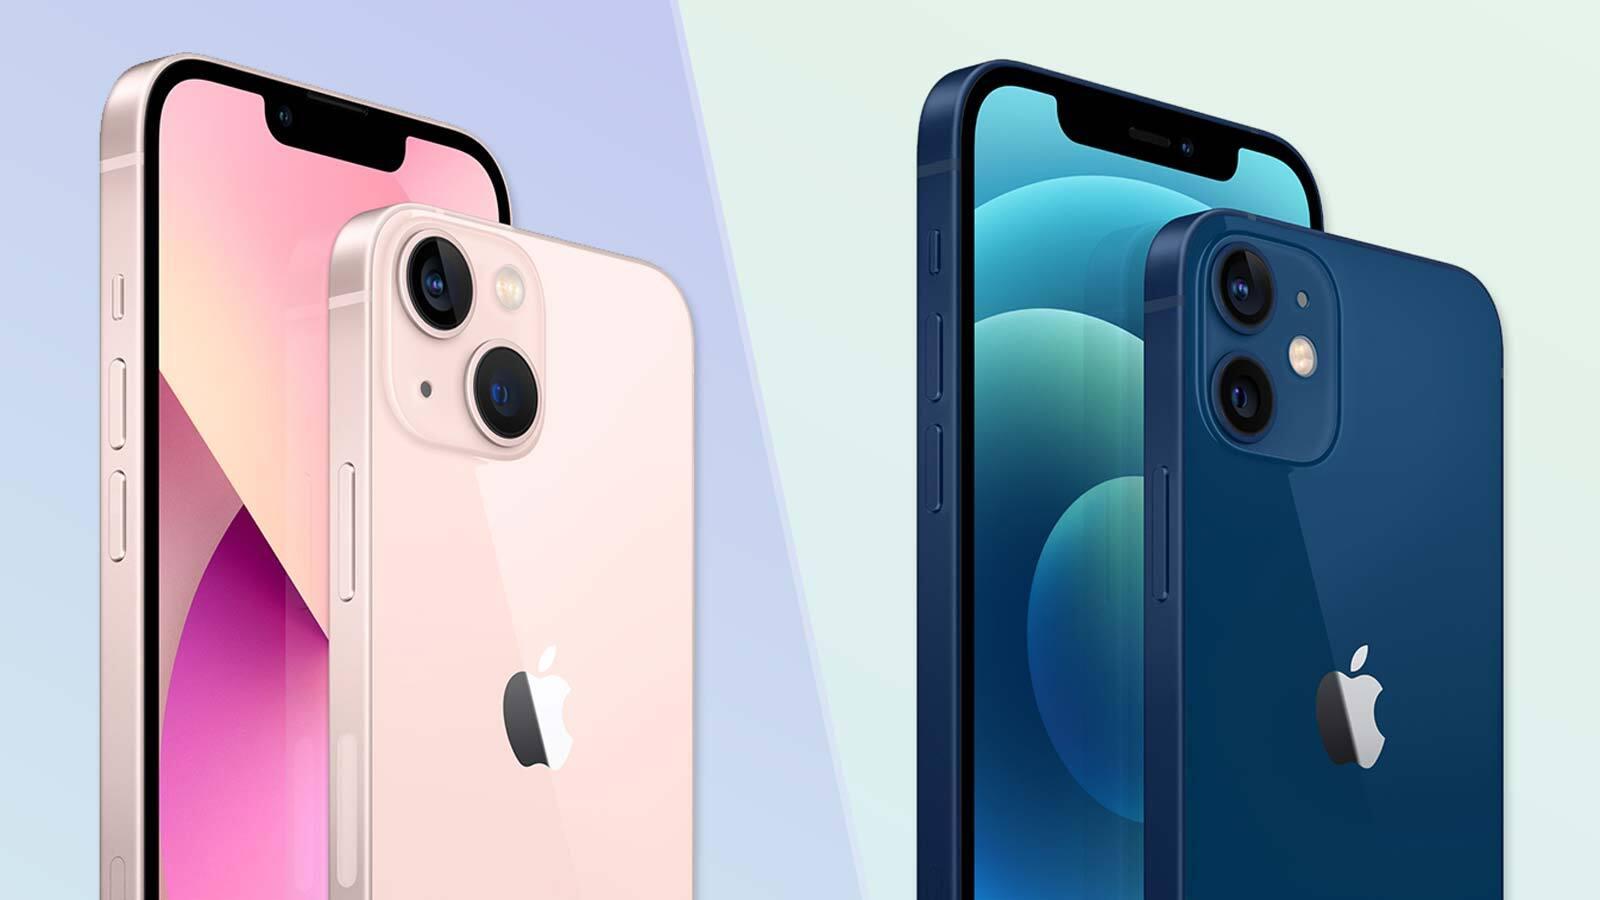 iPhone 13 Pro Max vs iPhone 12 Pro Max Speed Test, iPhone 13 Pro Max vs iPhone 12 Pro Max the Best Camera Picture, iPhone 13 Pro Max